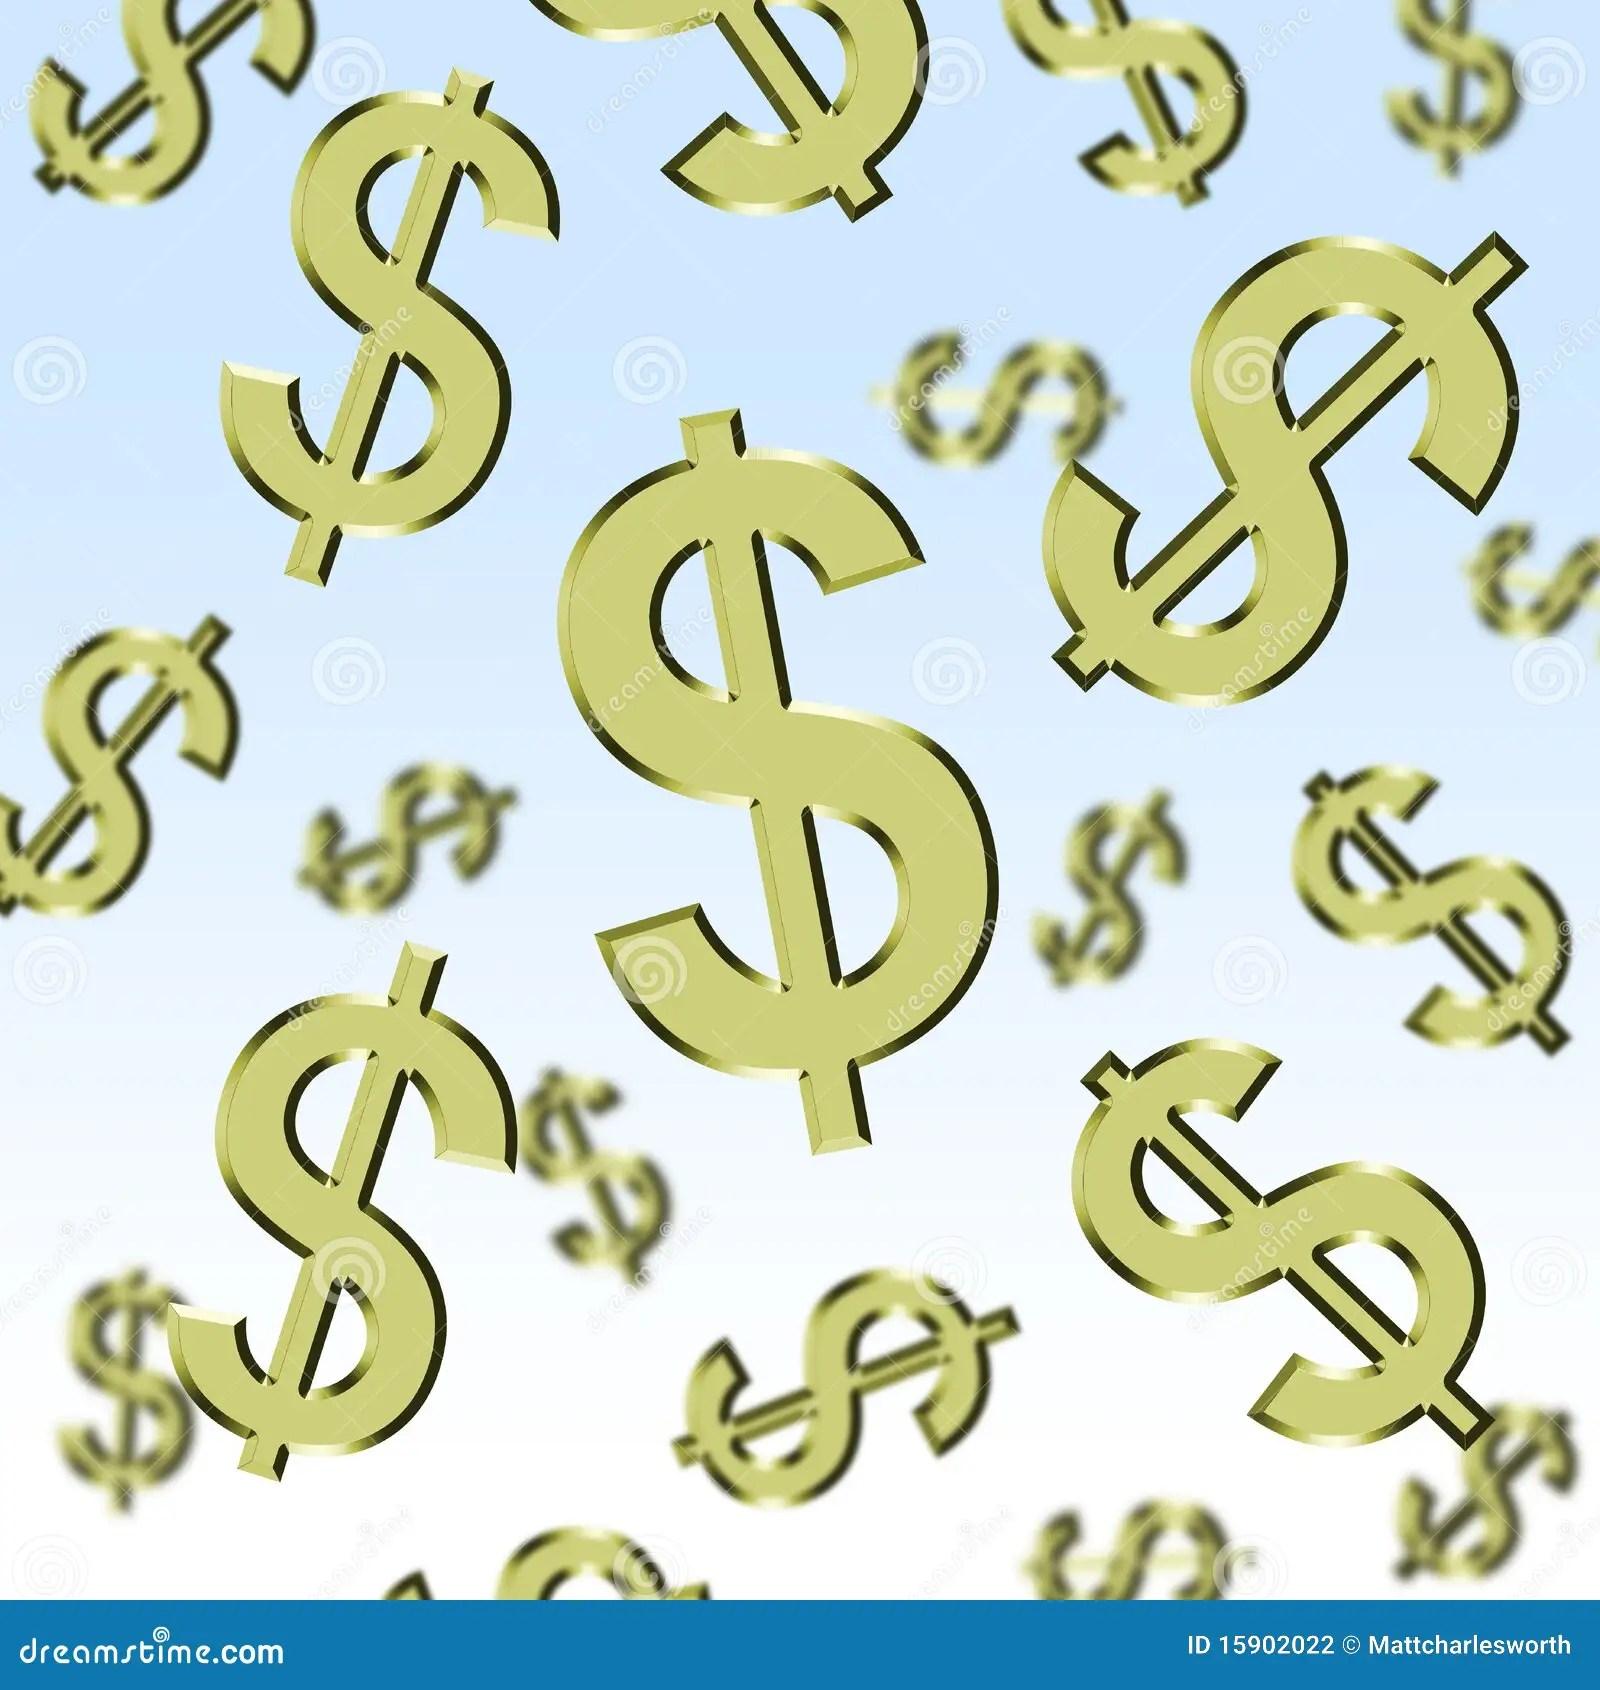 Cartoon Animation Wallpaper Free Download Raining Dollars Stock Illustration Image Of Dollars